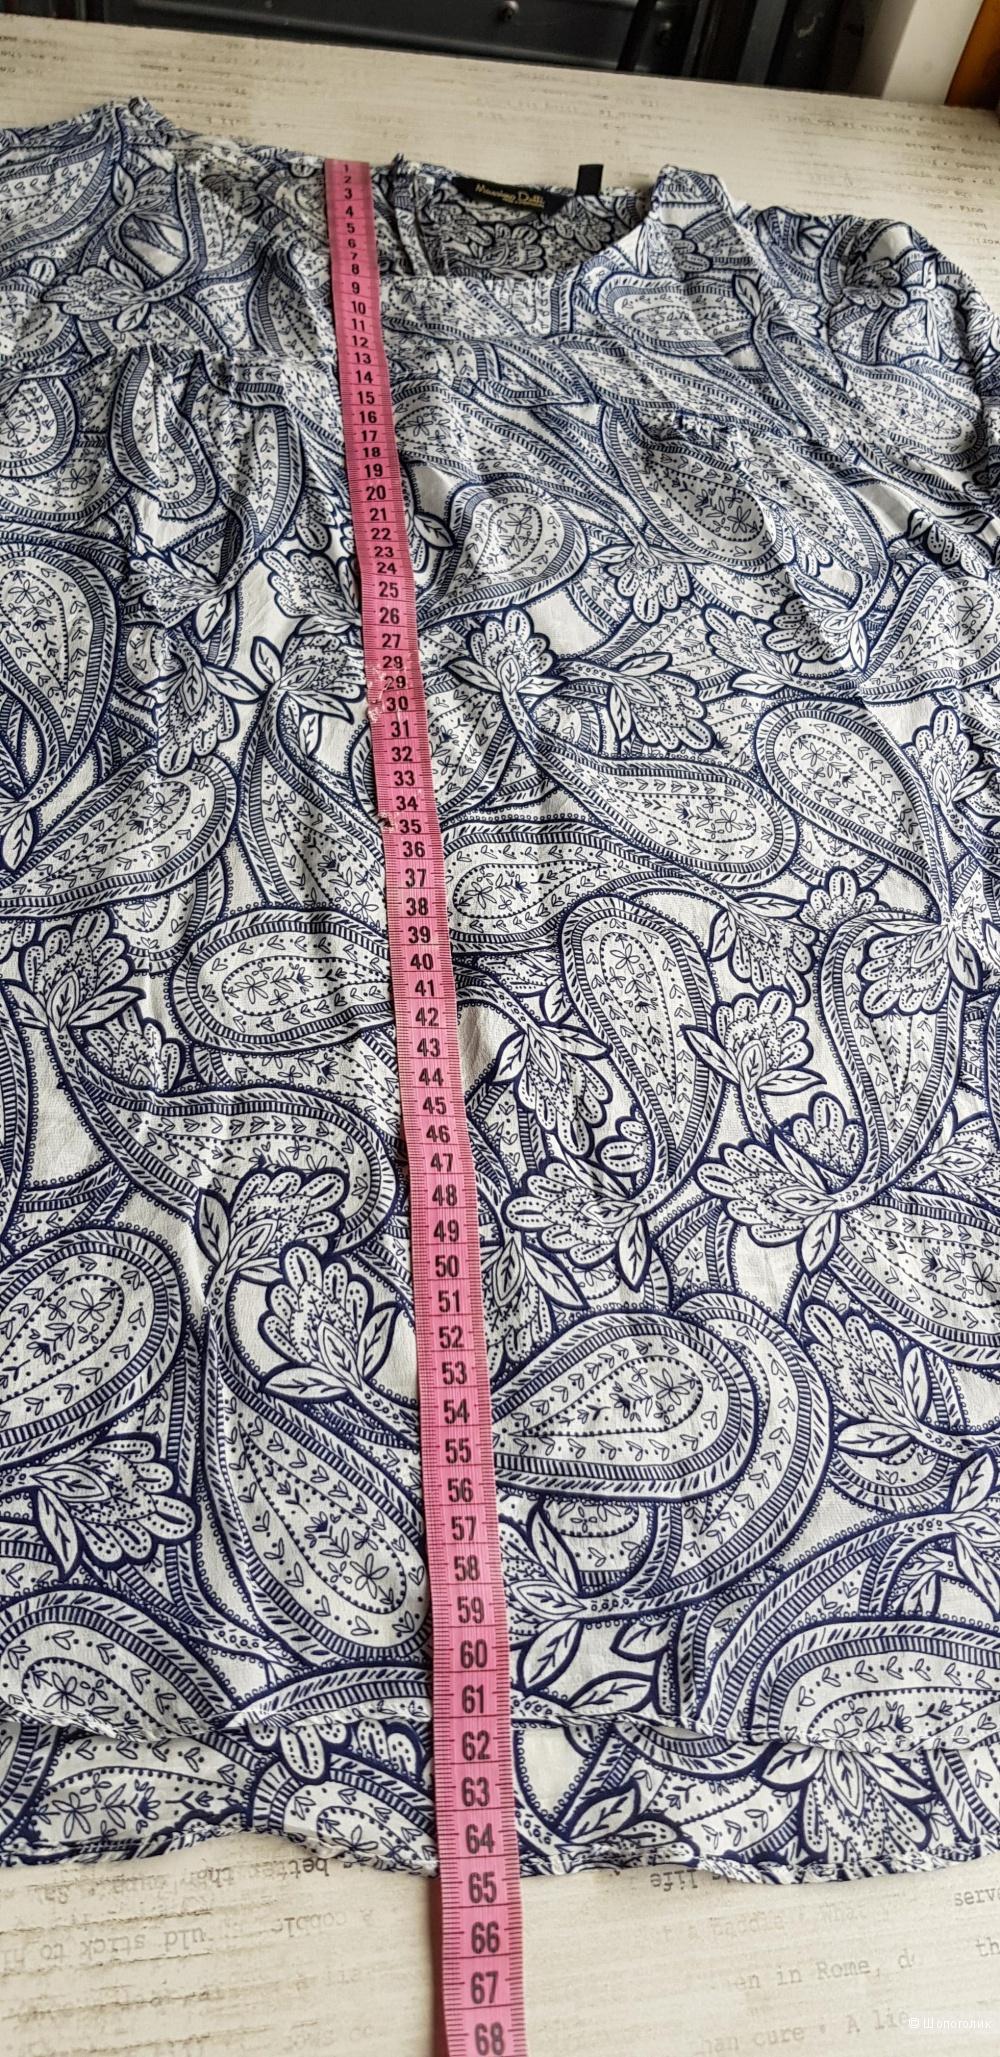 Шёлковая блузка Massimo Dutti р.40